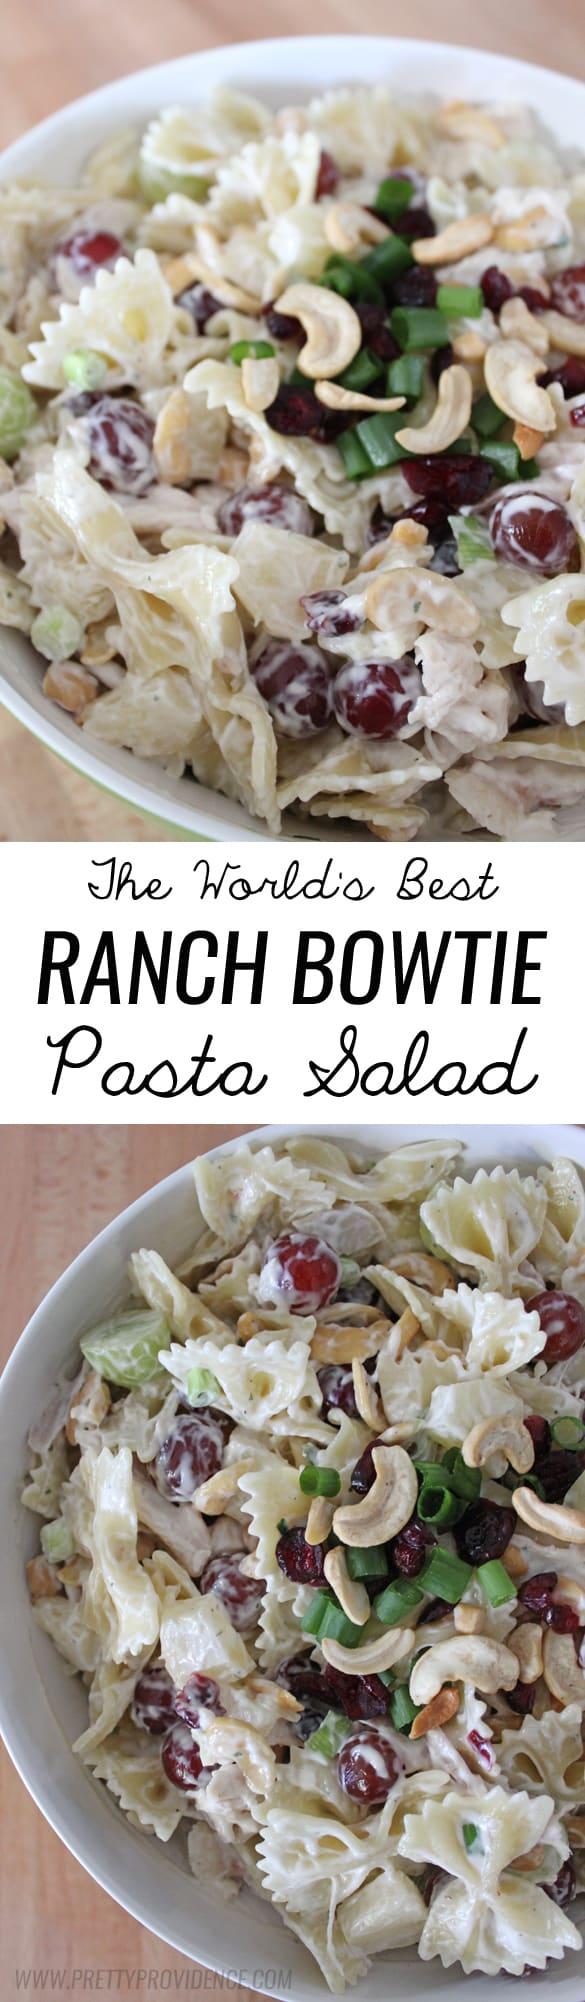 ranch-bowtie-pasta-salad-button